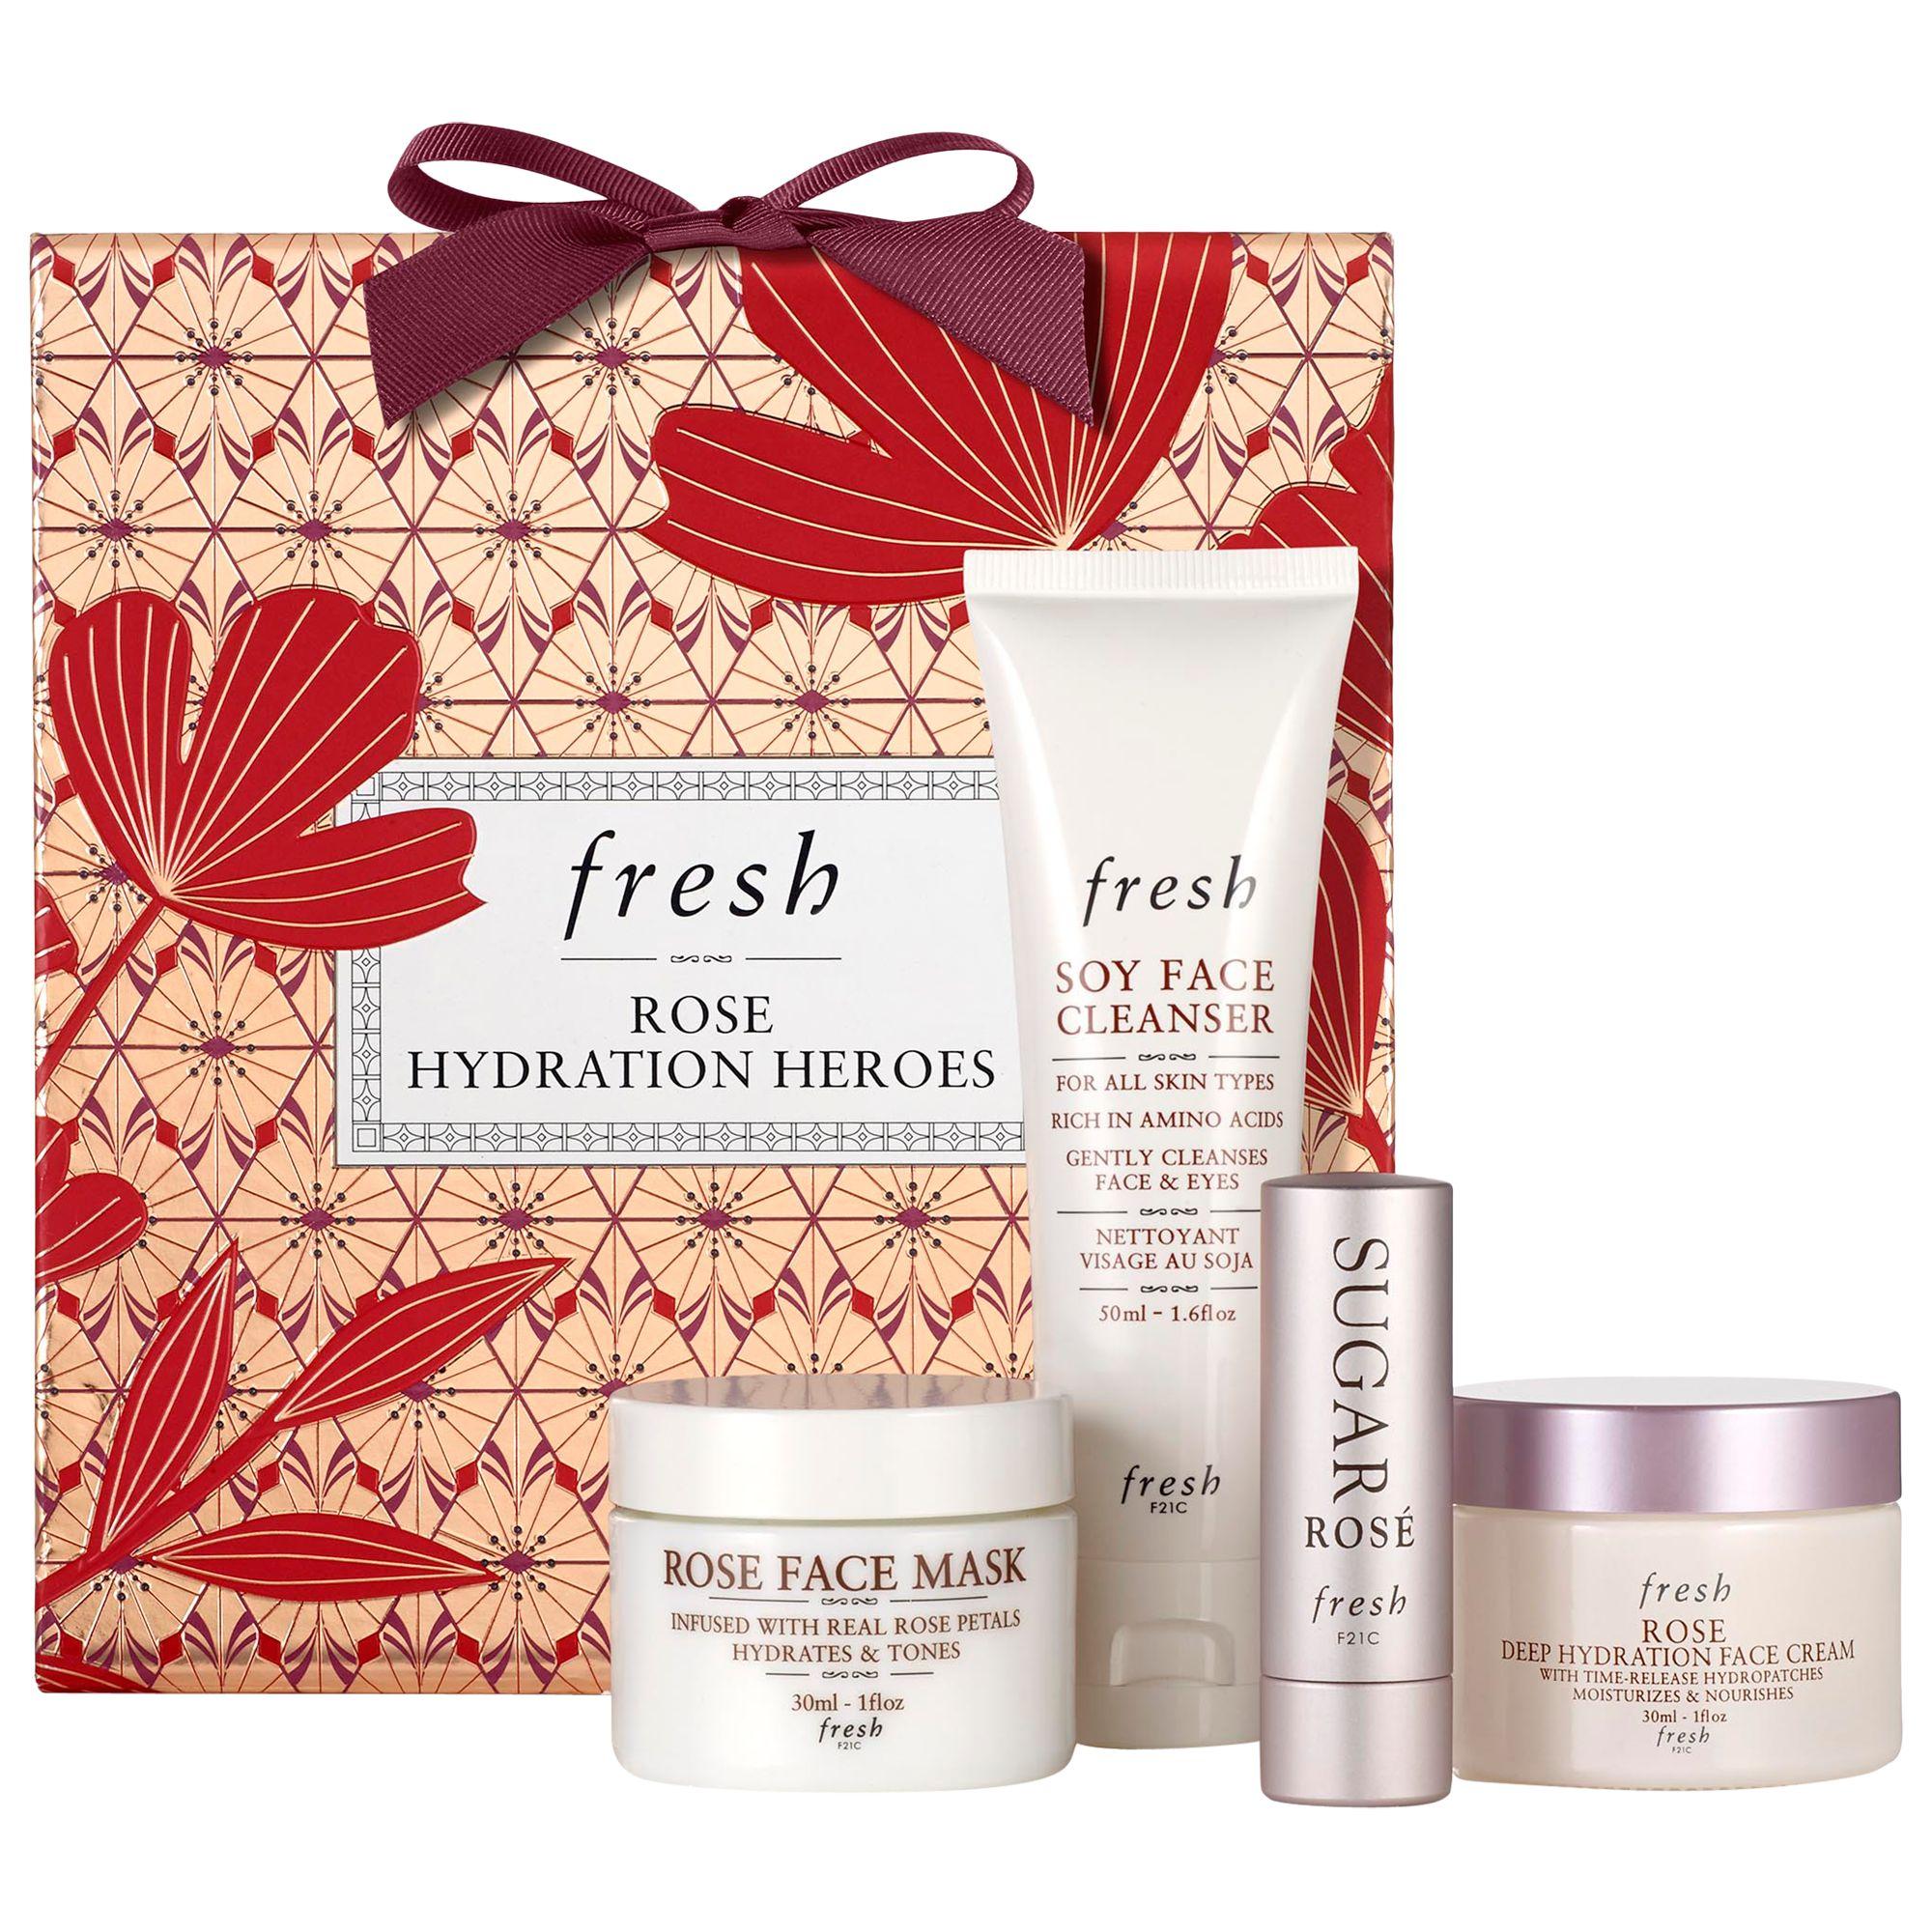 Fresh Rose Hydration Heroes Skincare Gift Set At John Lewis Partners